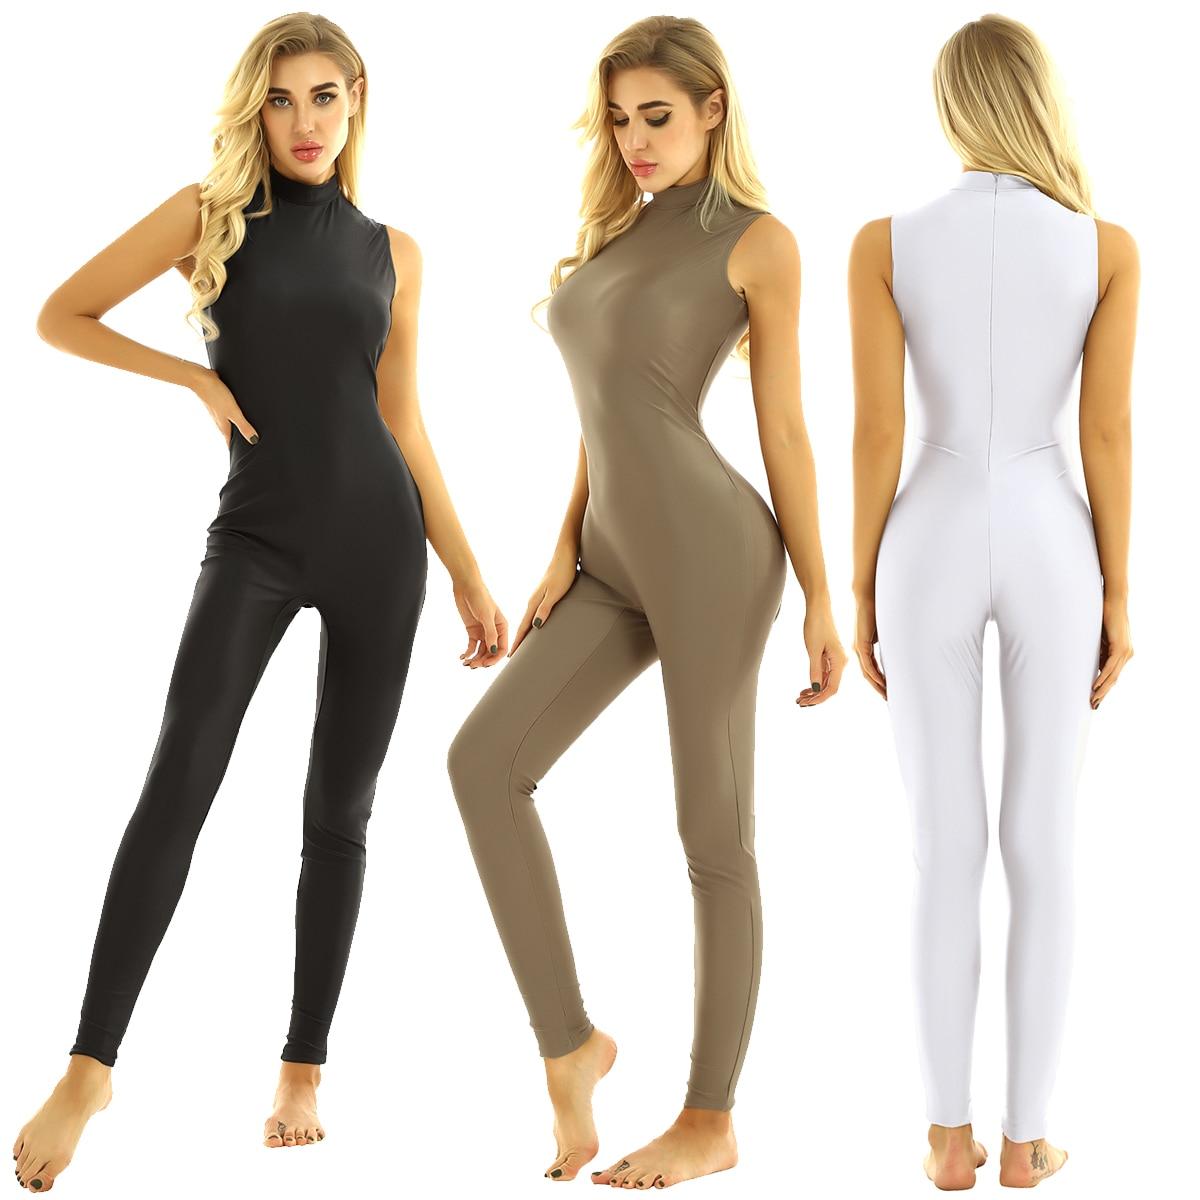 Women High Neck Sleeveless Stretchy Unitard Yoga Dance Bodysuit Adult Gymnastics Leotard Sports Jumpsuit Ballet Dance Costume